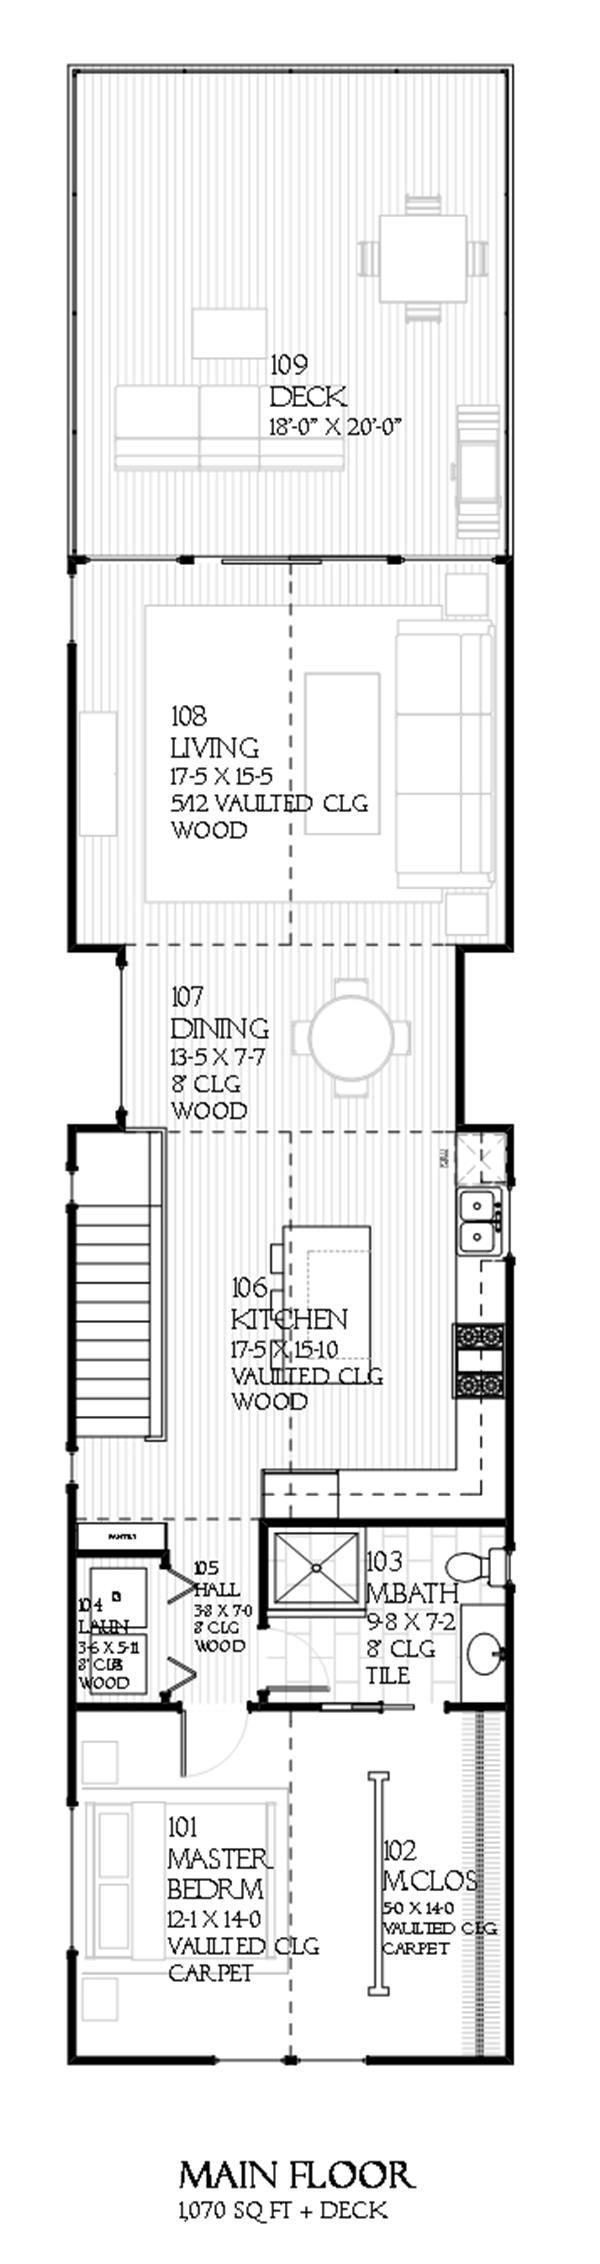 79 best saparitos images on pinterest floor plans square feet 168 1102 house plan upper level